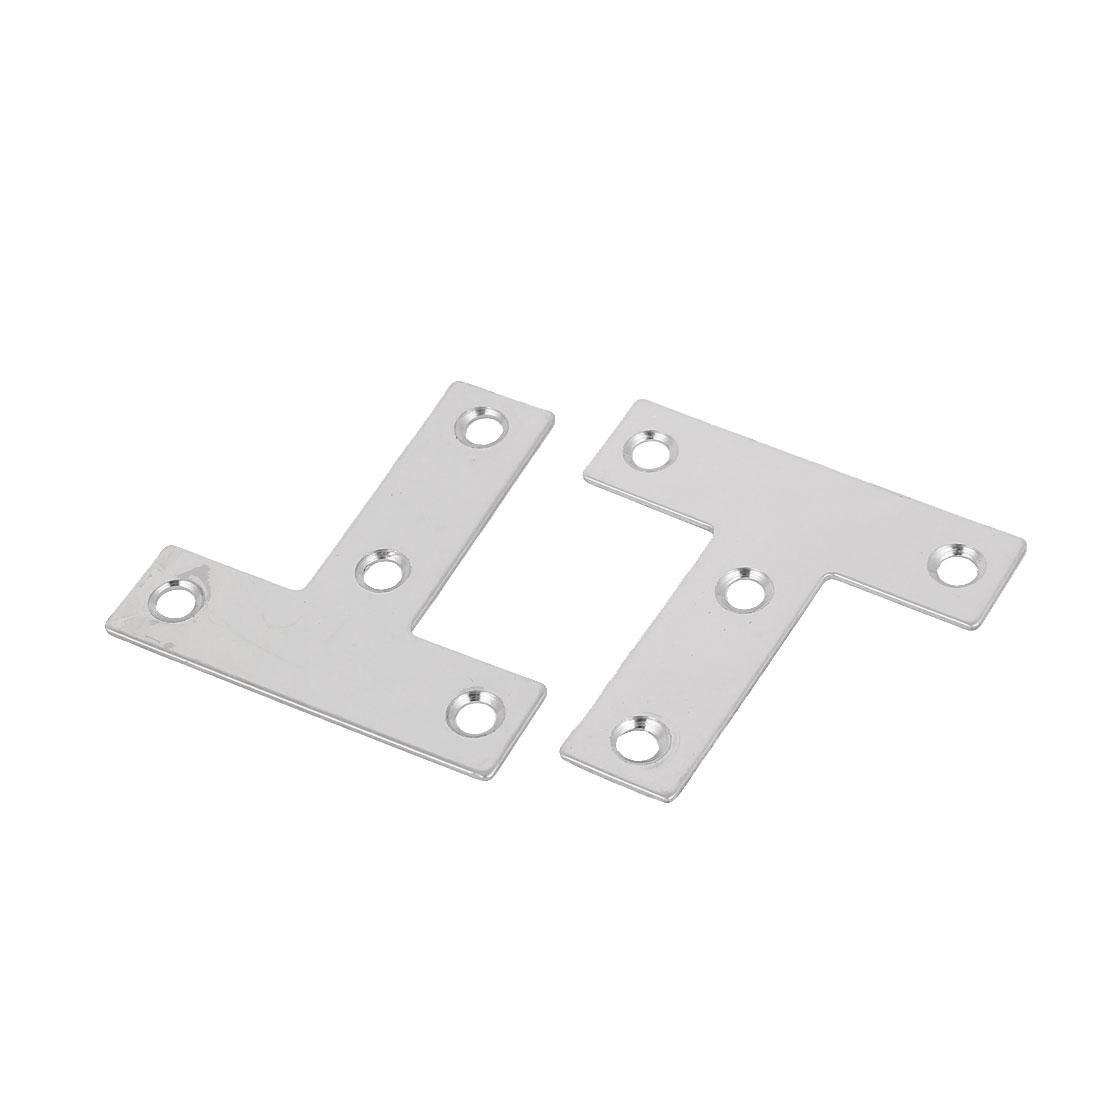 50mmx50mm T Shaped Stainless Steel Angle Bracket Corner Brace Silver Tone 2 Pcs